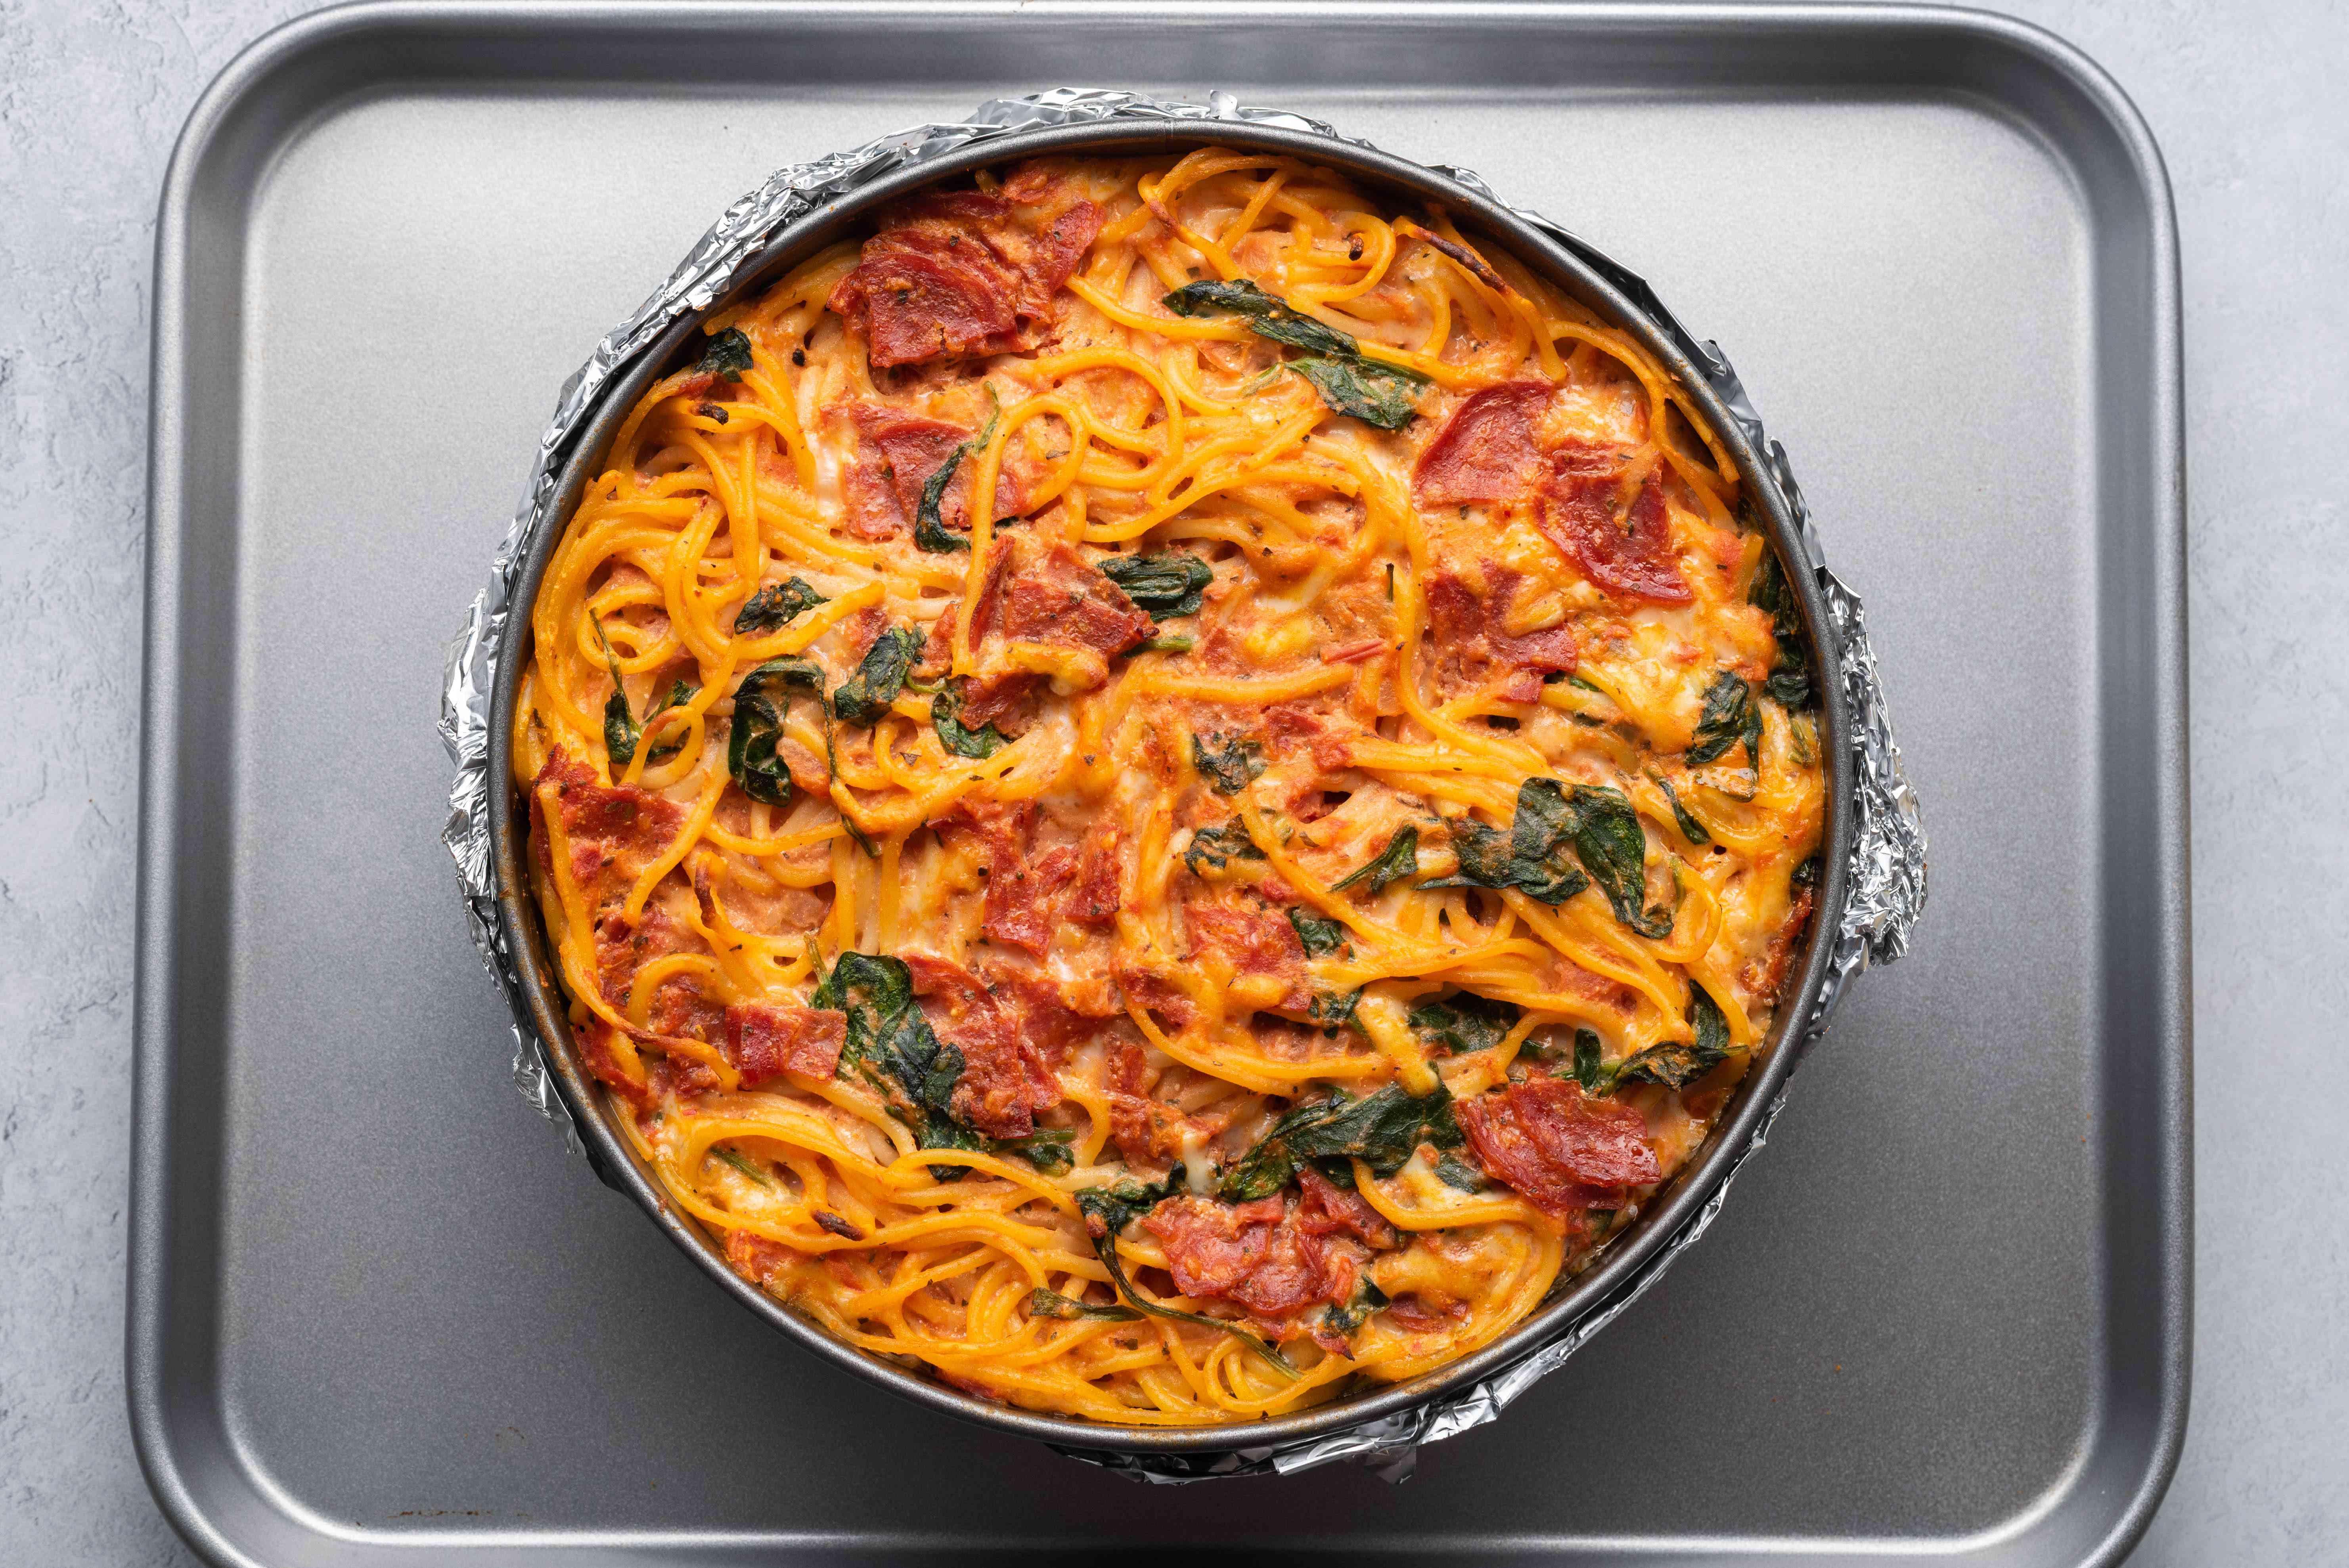 Place the springform pan onto a baking sheet